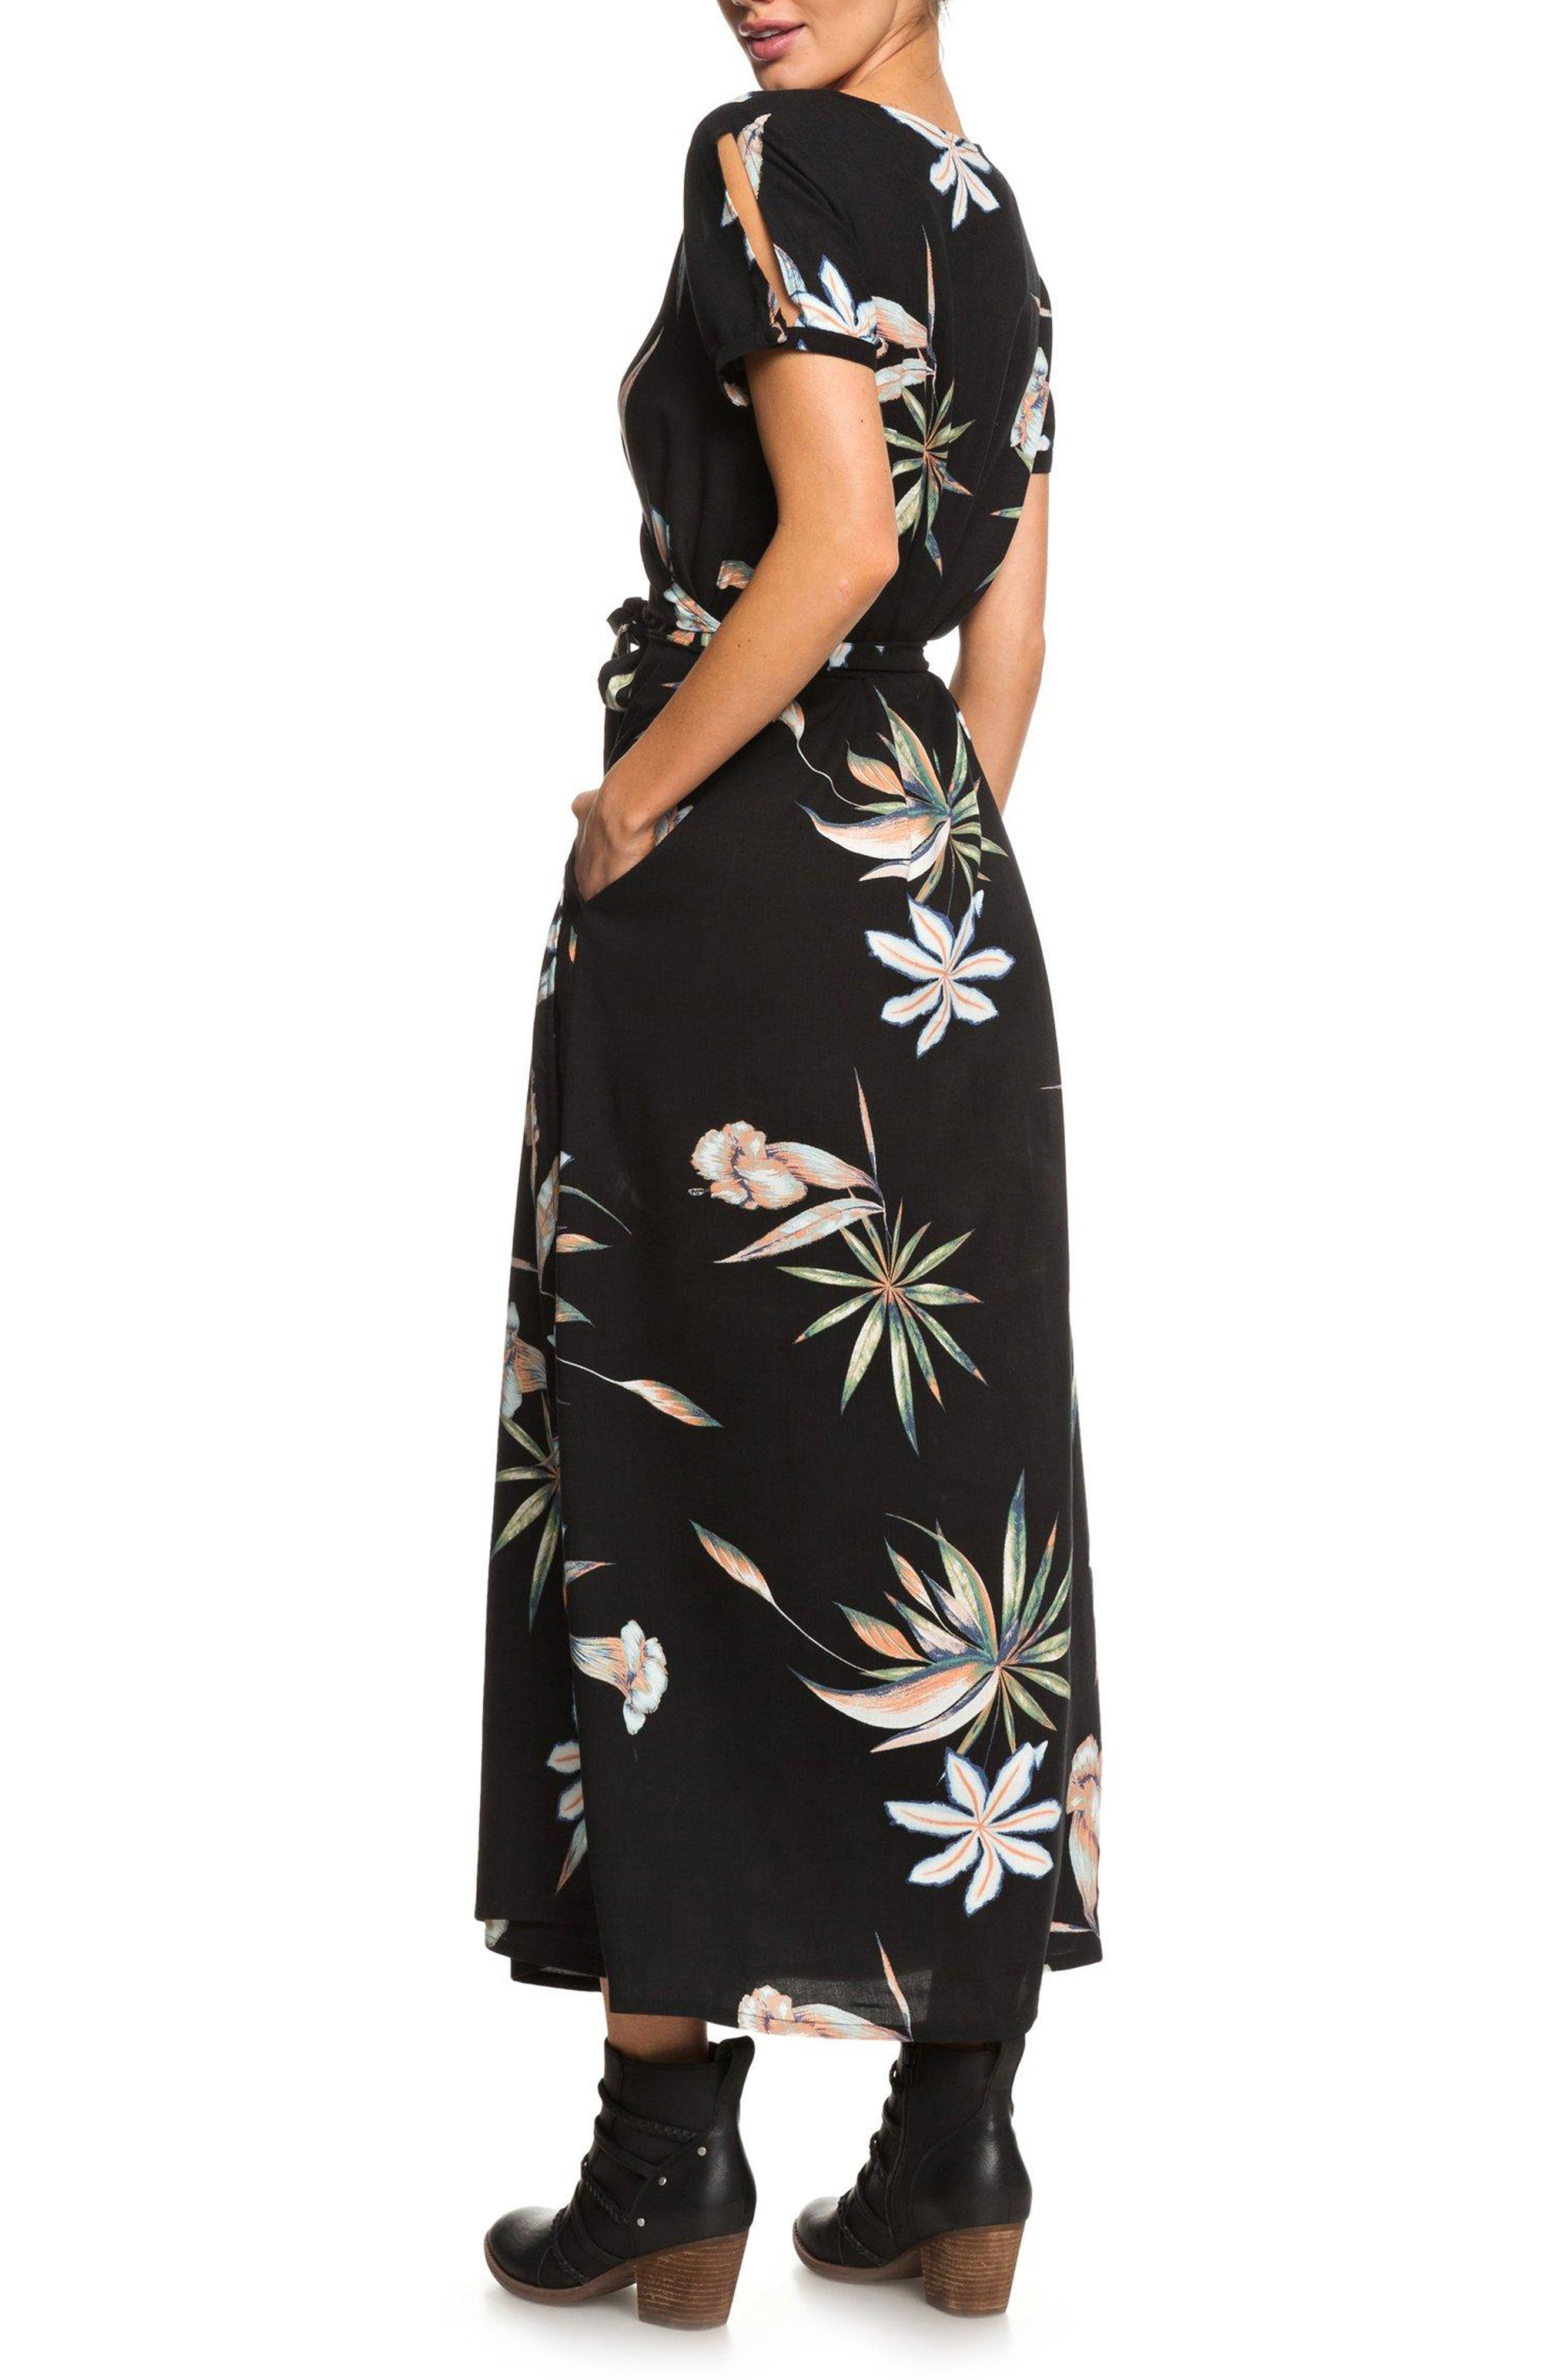 Lotus Heart Midi Dress,                             Alternate thumbnail 2, color,                             TRUE BLACK NIGHTLIGHTS